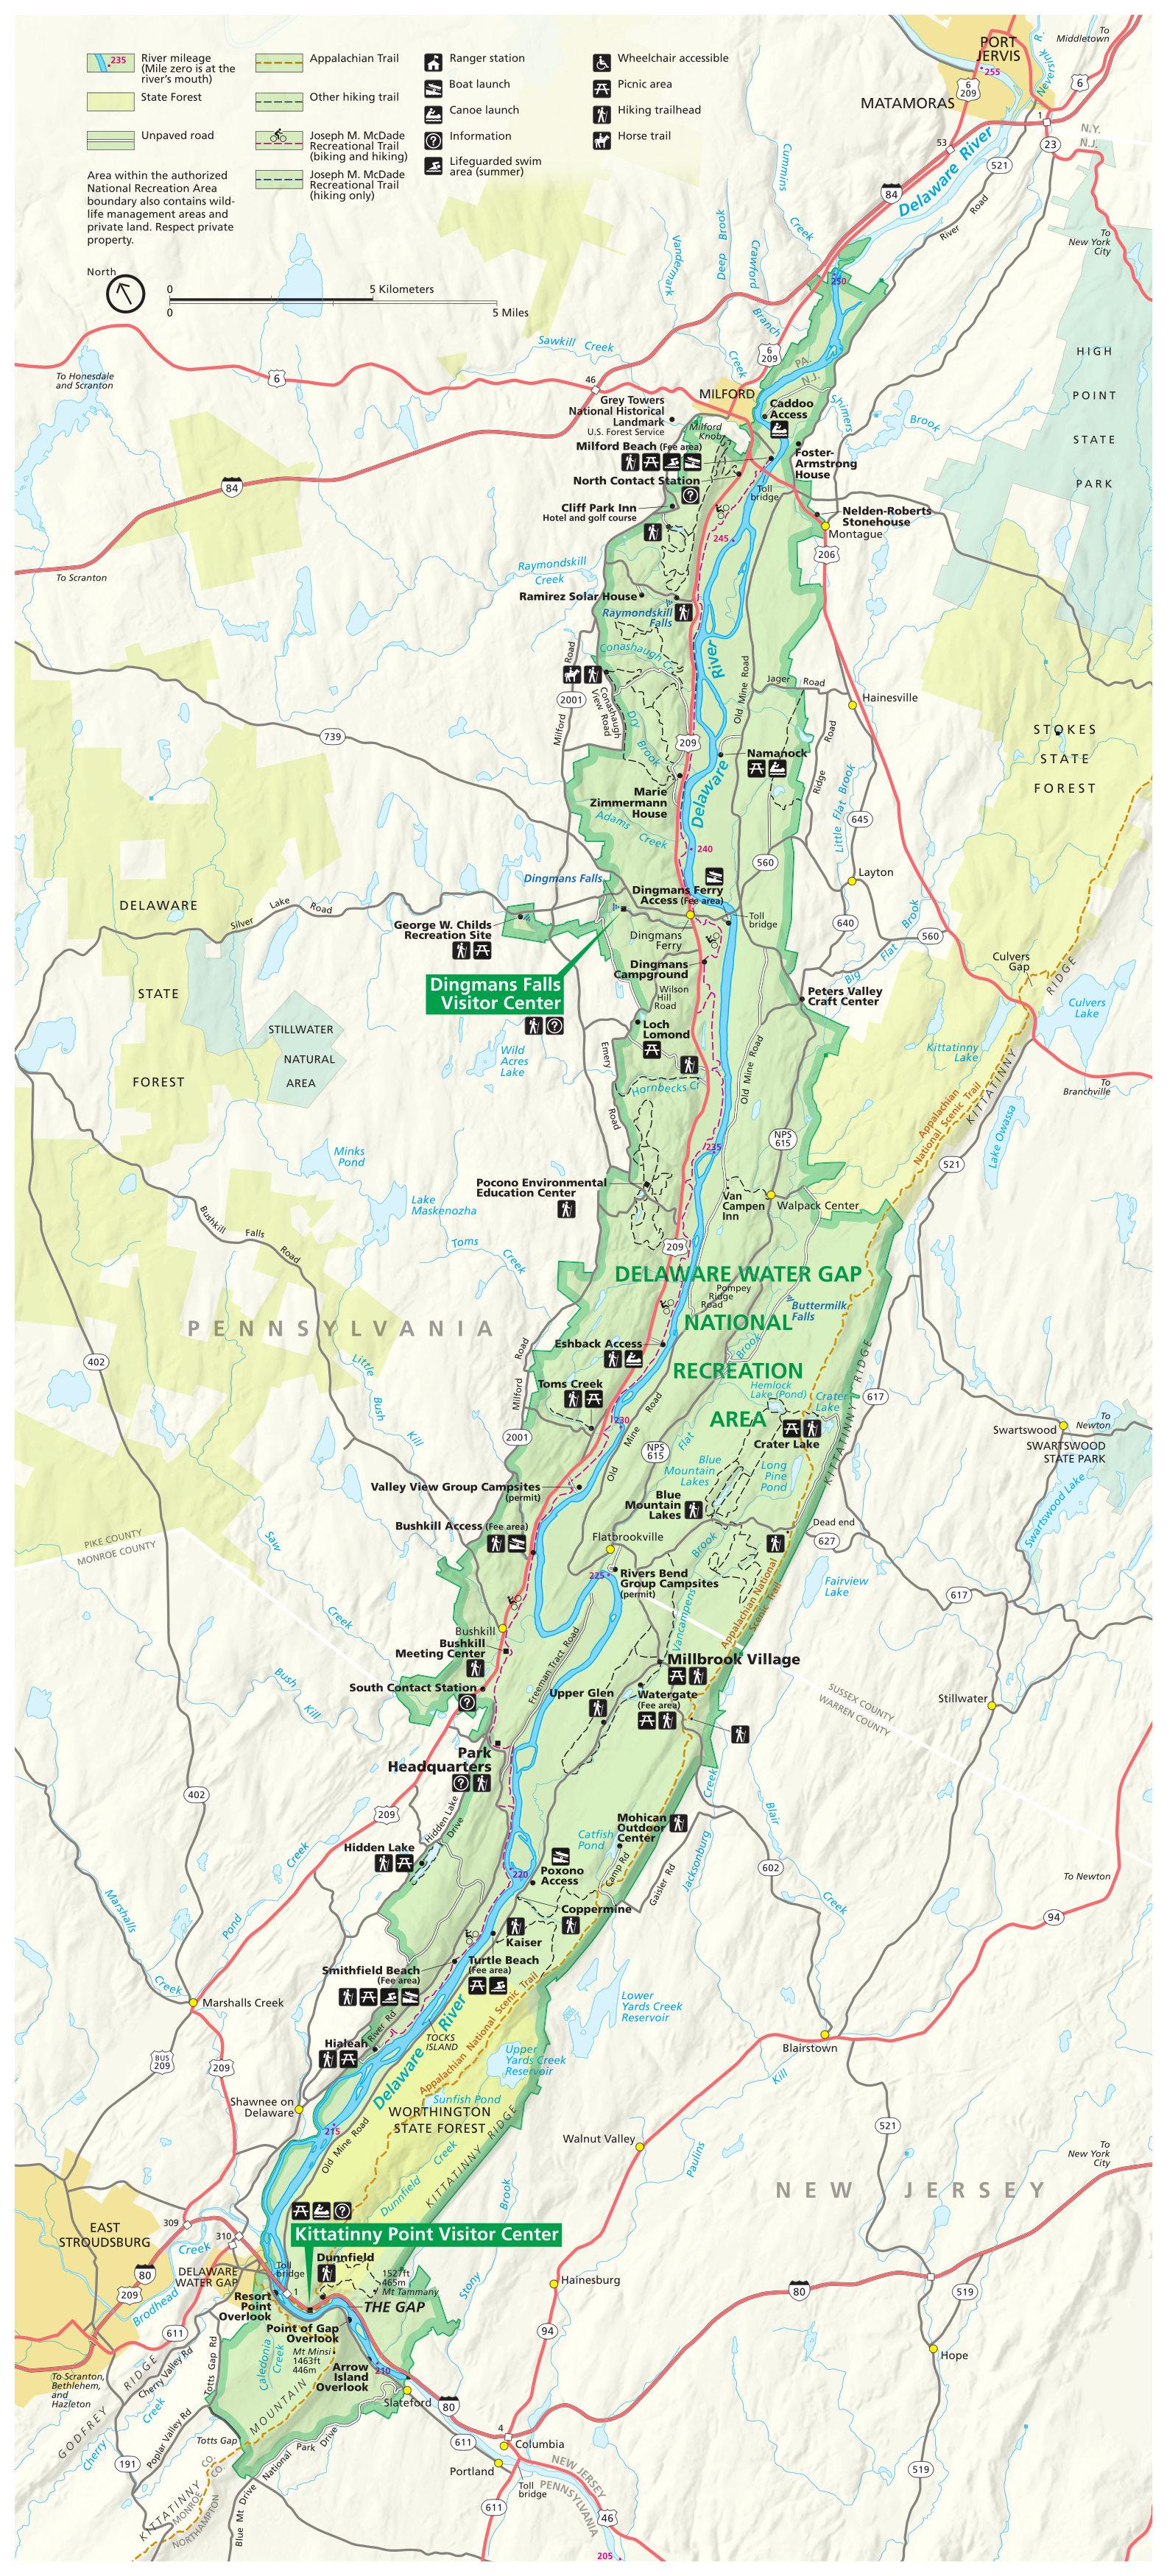 Pa State Employee Travel